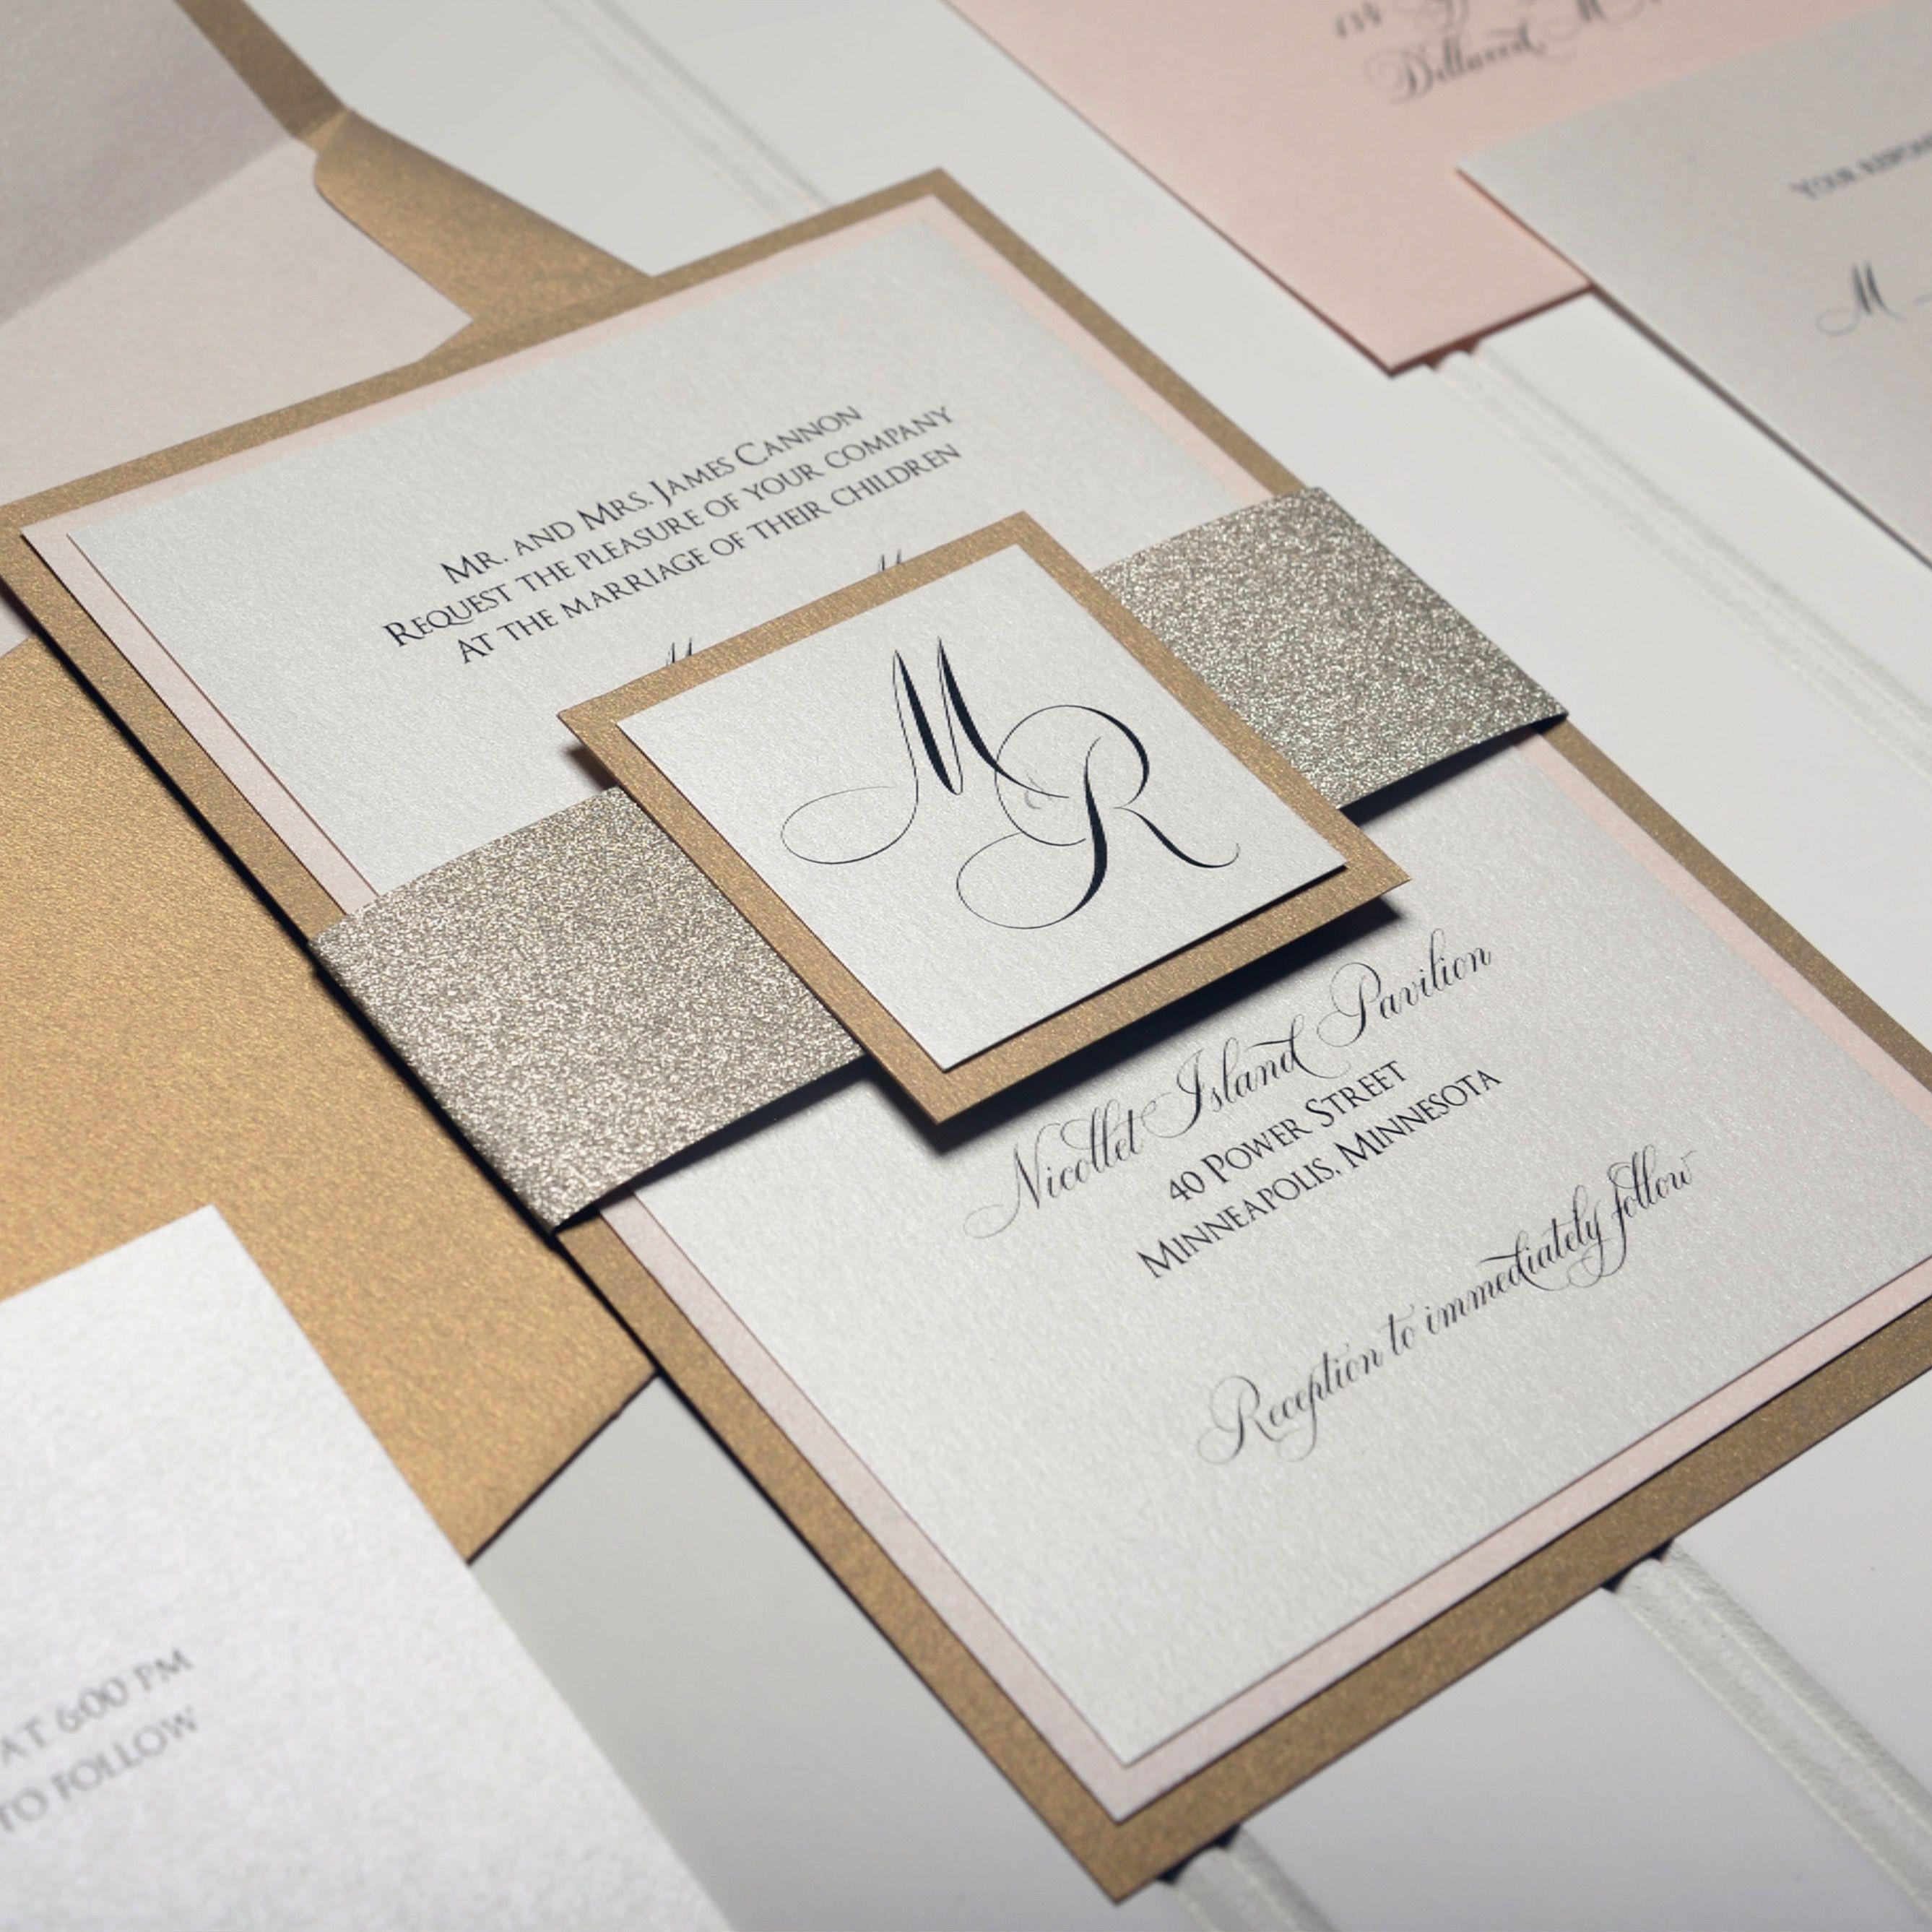 Not Found Ivory Isle Designs Wedding Invitations Belly Band Wedding Invitations Wedding Invitation Sets